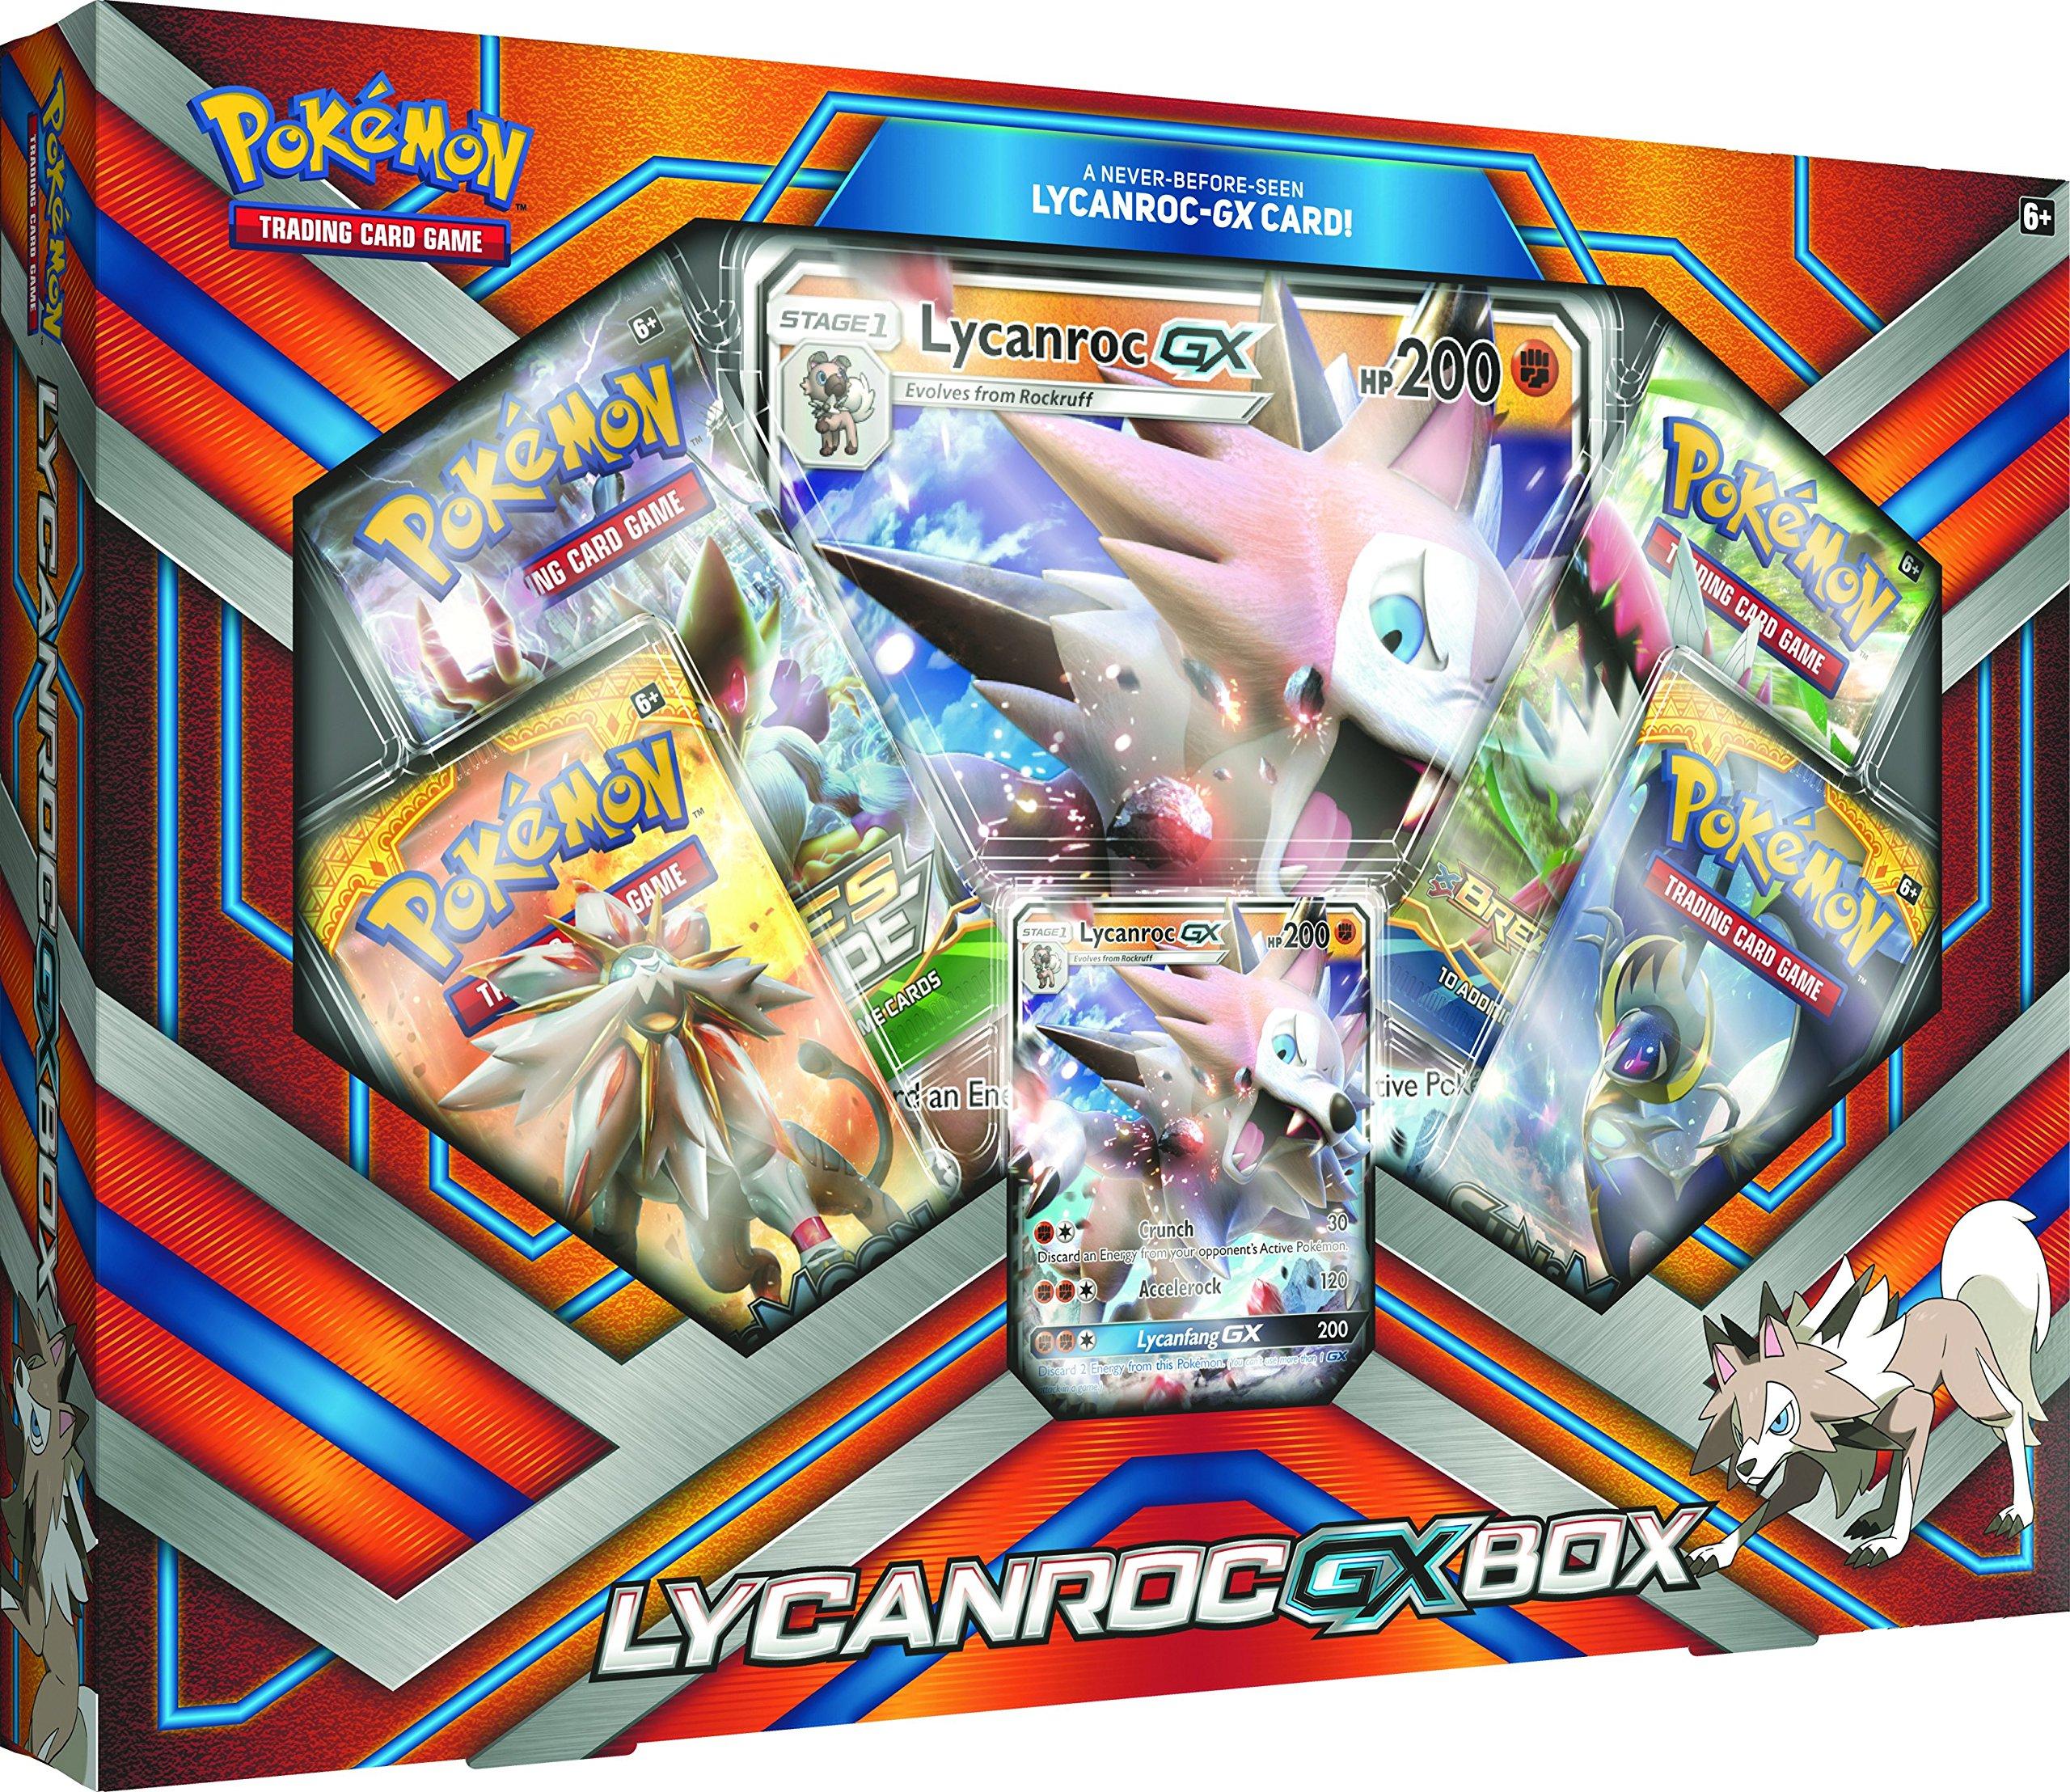 Pokemon TCG: 2017 Lycanroc Gx Box with 1 Foil Lycanroc Gx Card by Pokemon